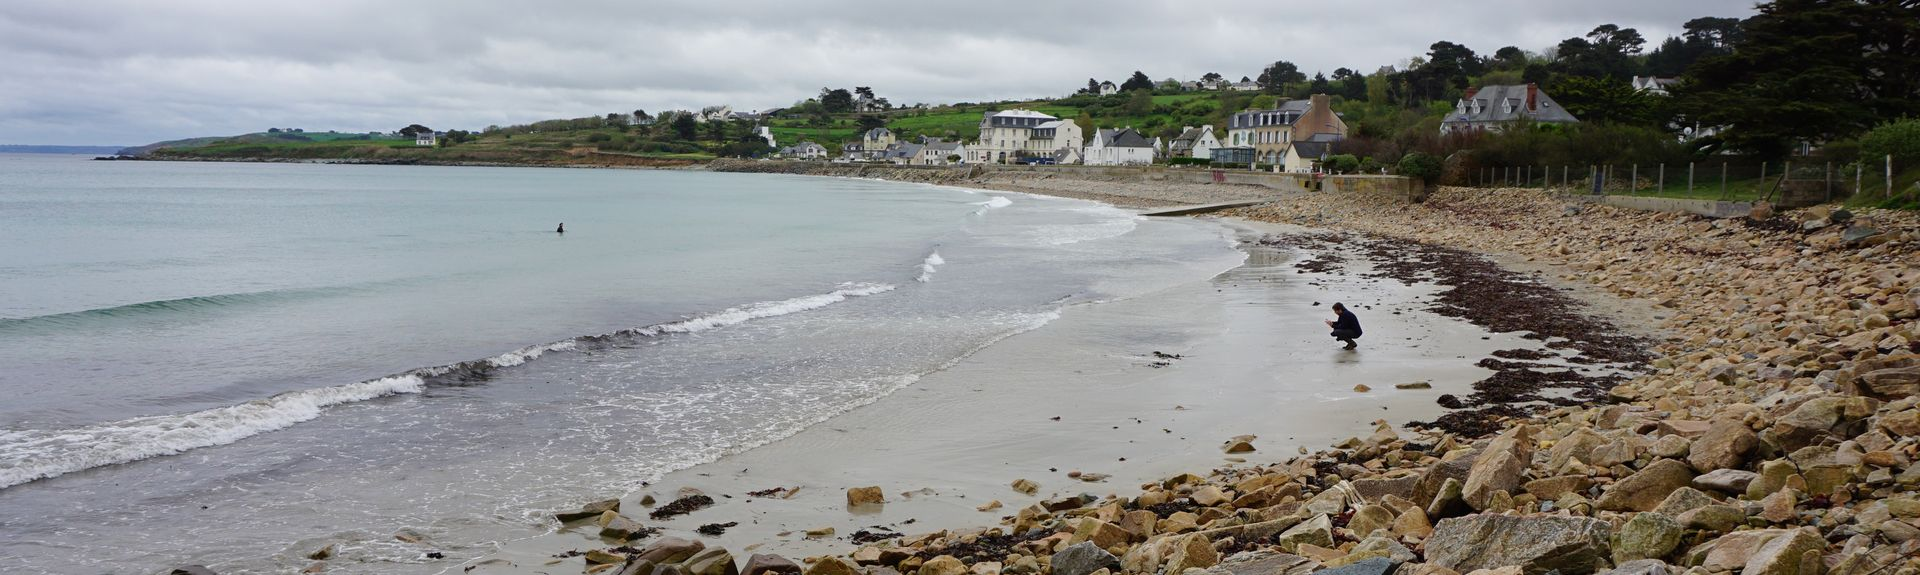 Sizun, Brittany, France